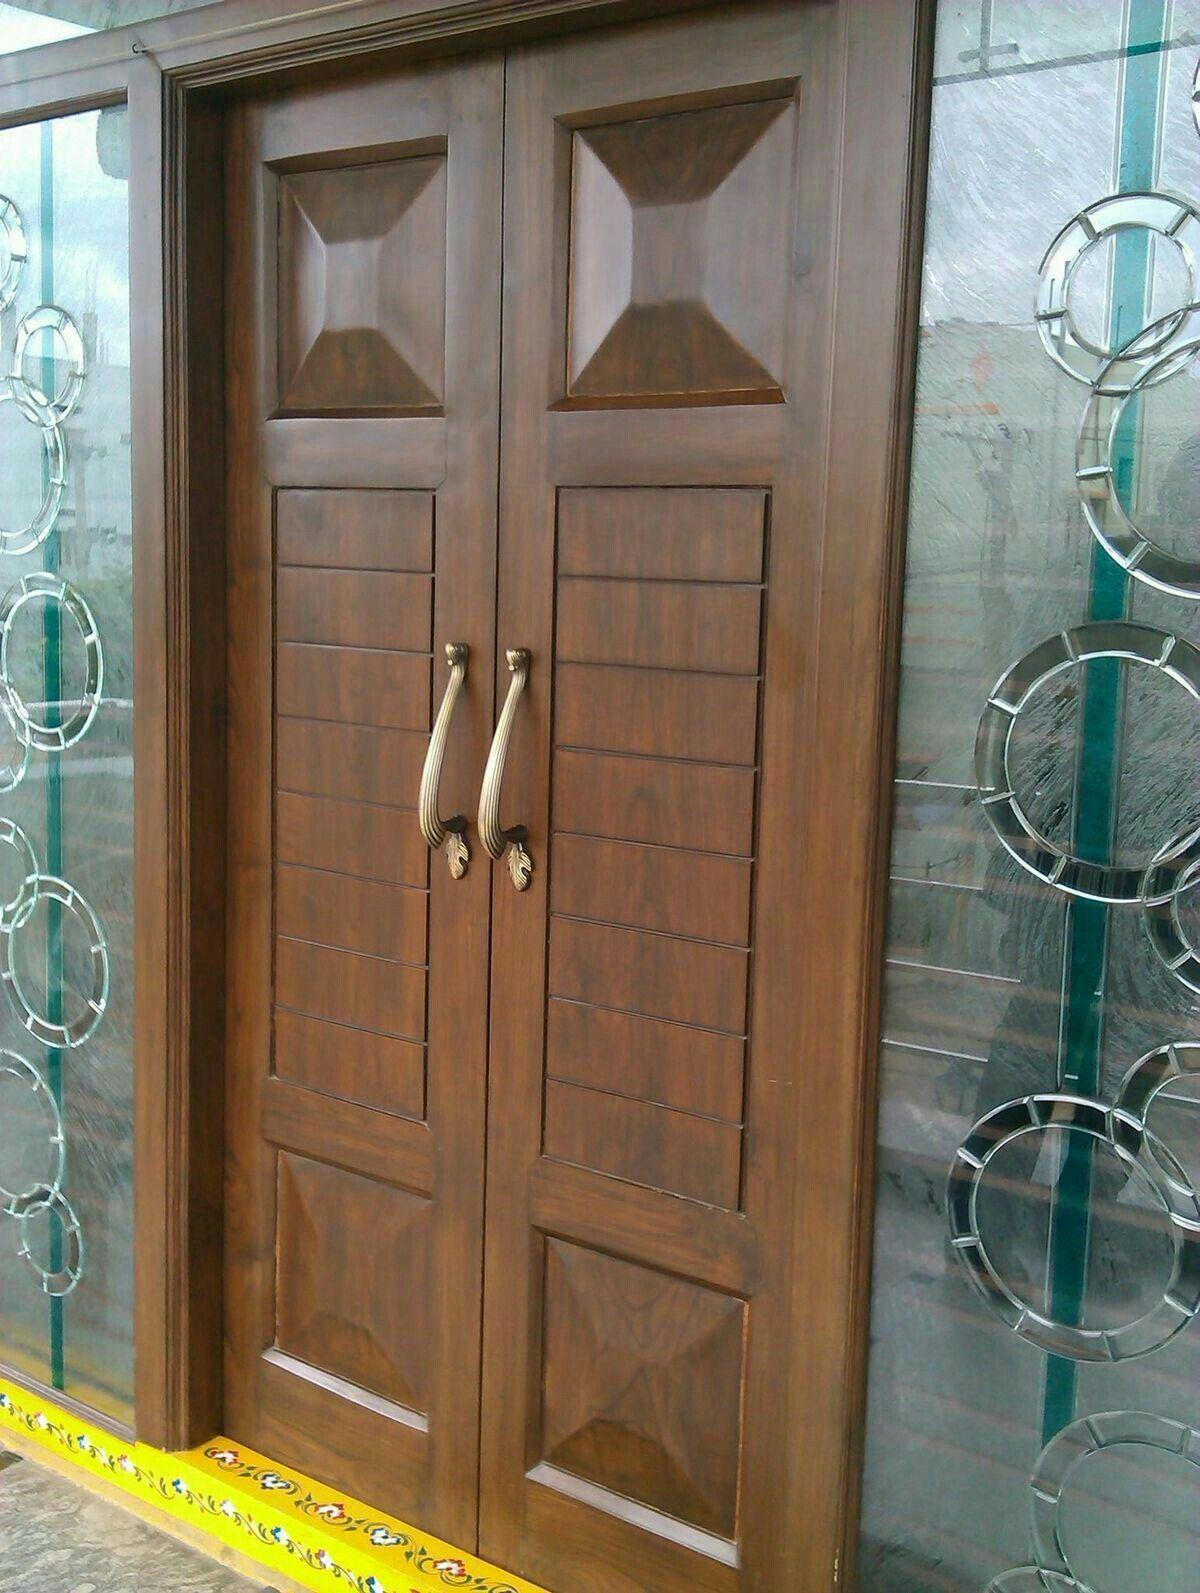 A Unique Front Door Transforms Any Home Exterior Get Cool Door Ideas With This List Of Wooden Front Door Design Front Door Design Wood Wooden Main Door Design,Duplex Apartment Design Plans